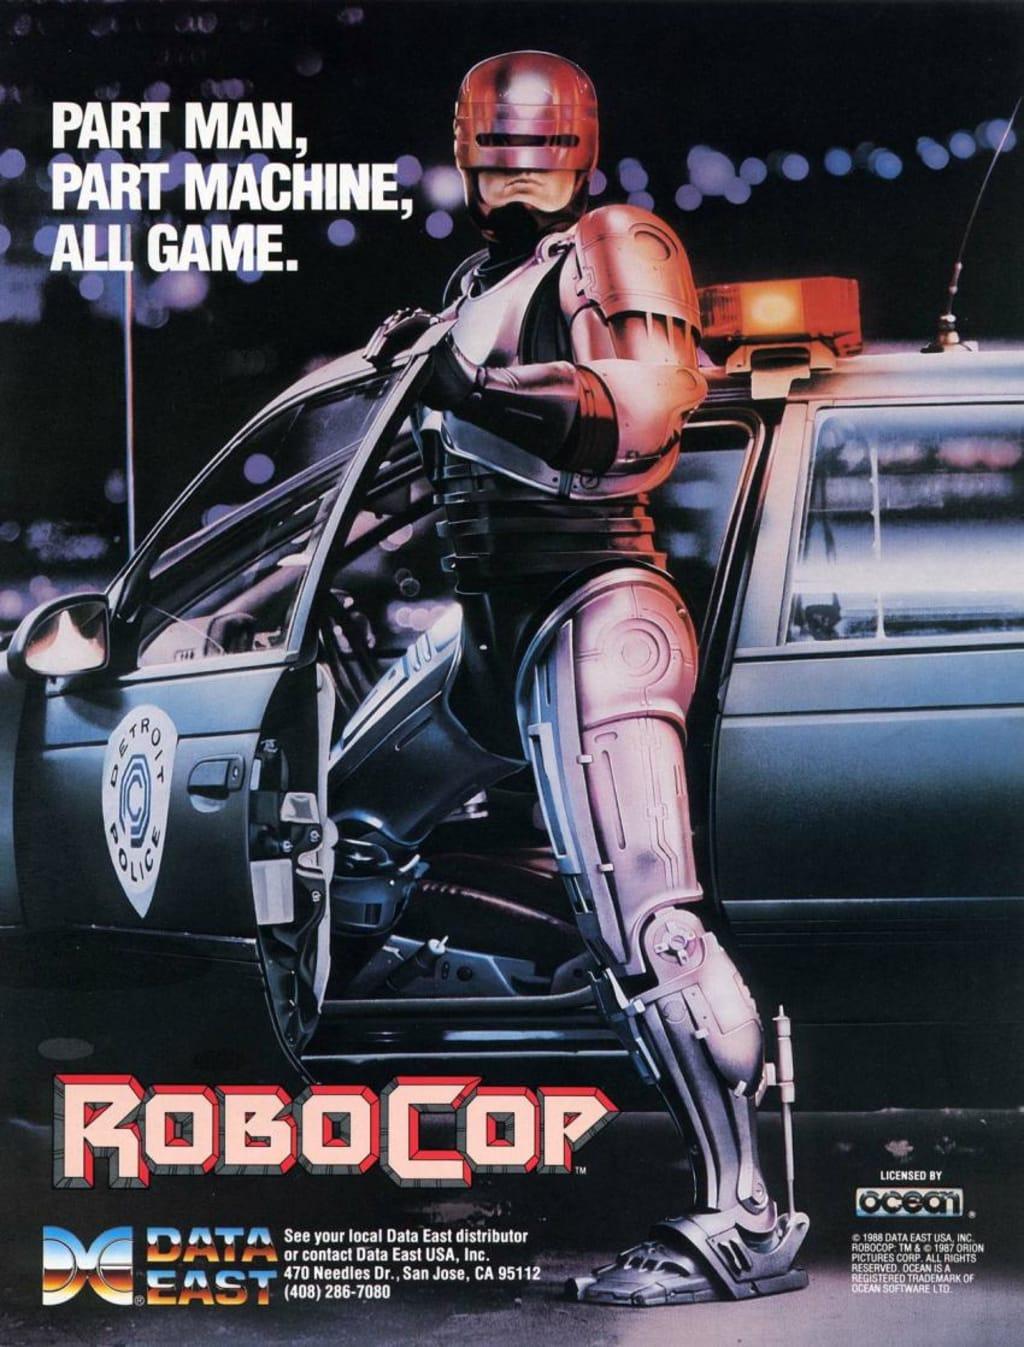 Robocop is Lawful Good